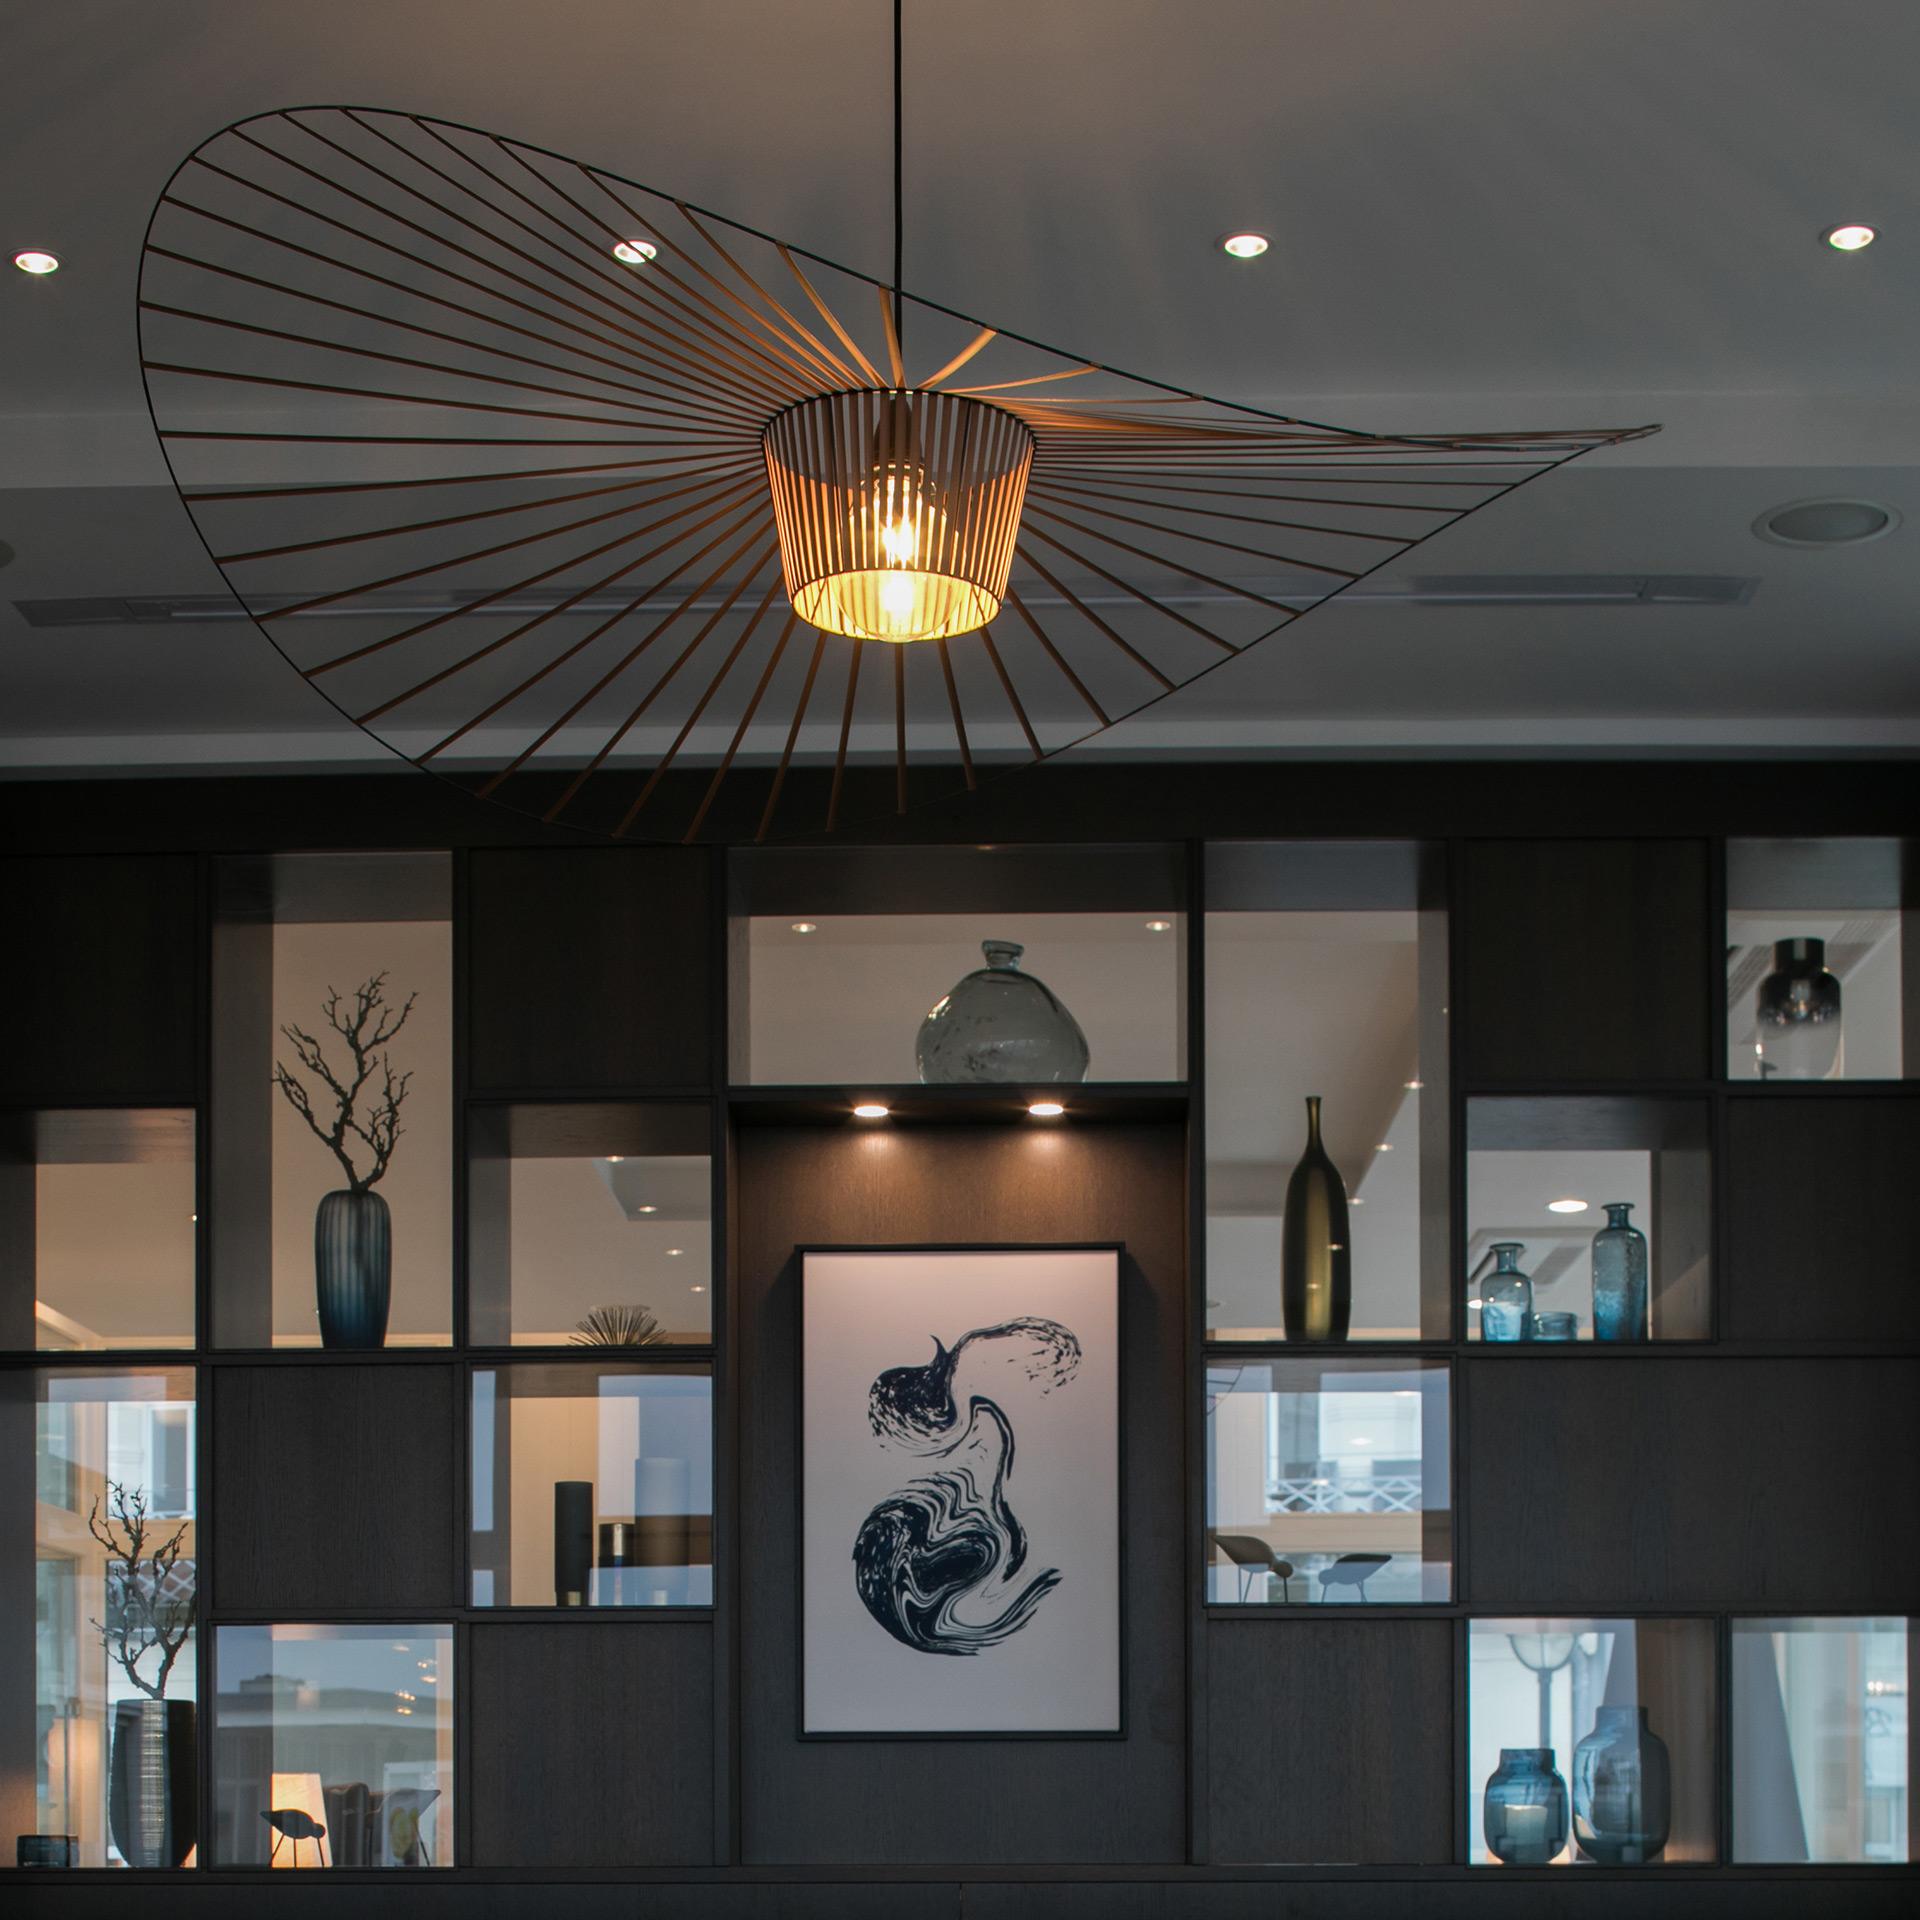 Joi design innenarchitektur interiordesign hotel am leuchtturm warnem nde creditss joi design for Hotel am leuchtturm